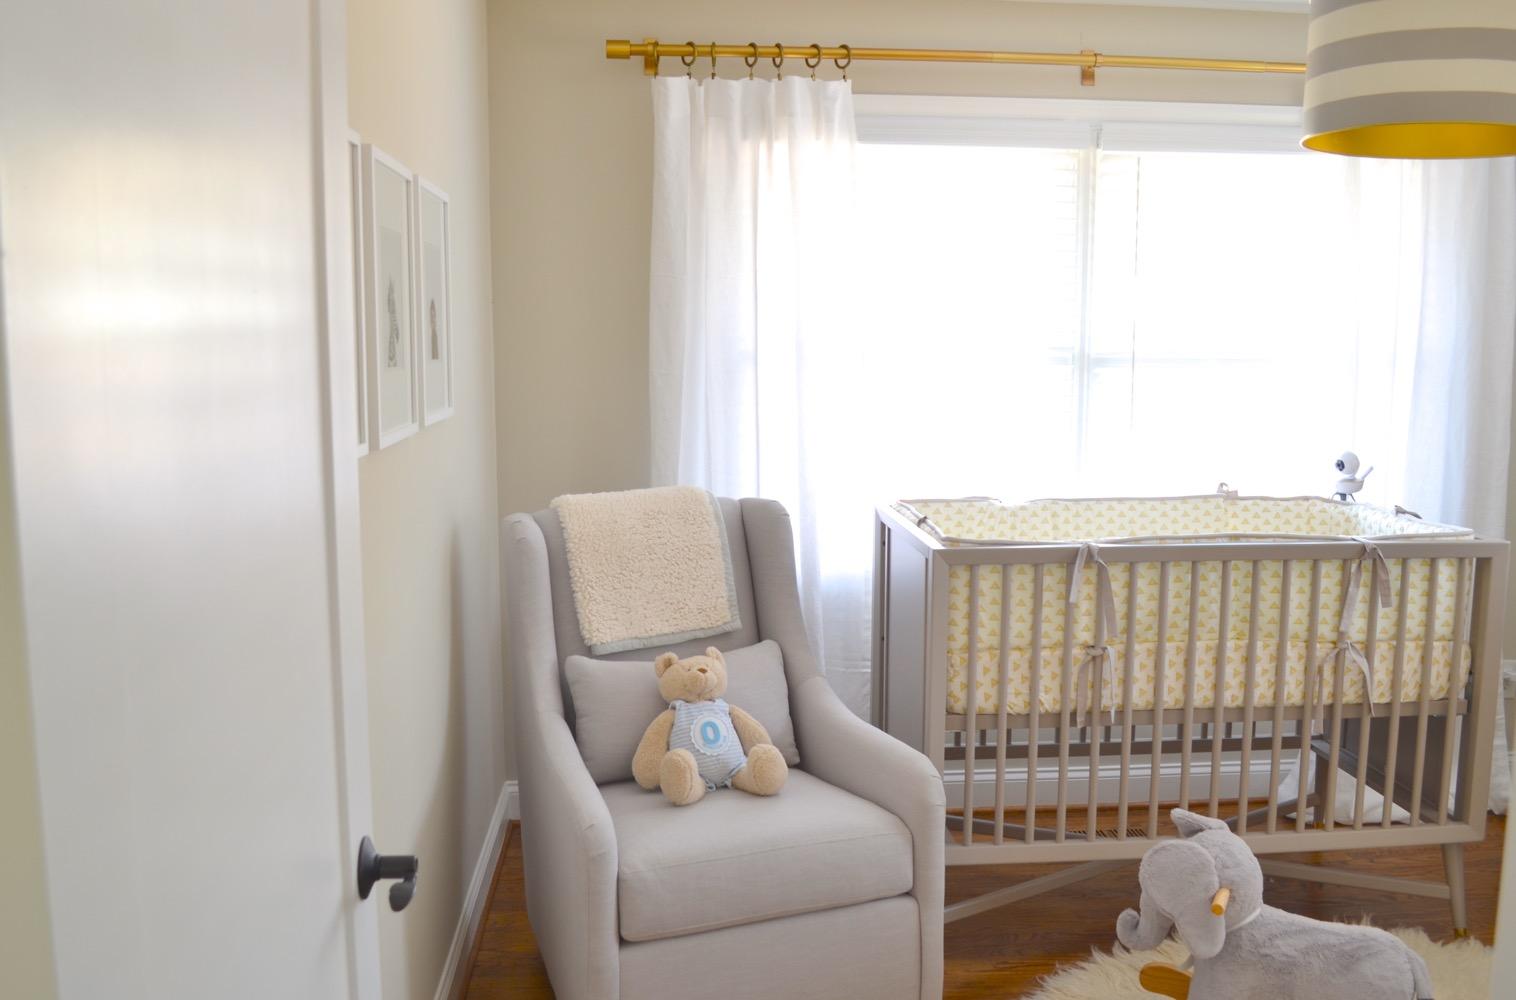 Nursery-decor-idea-boy04.jpg